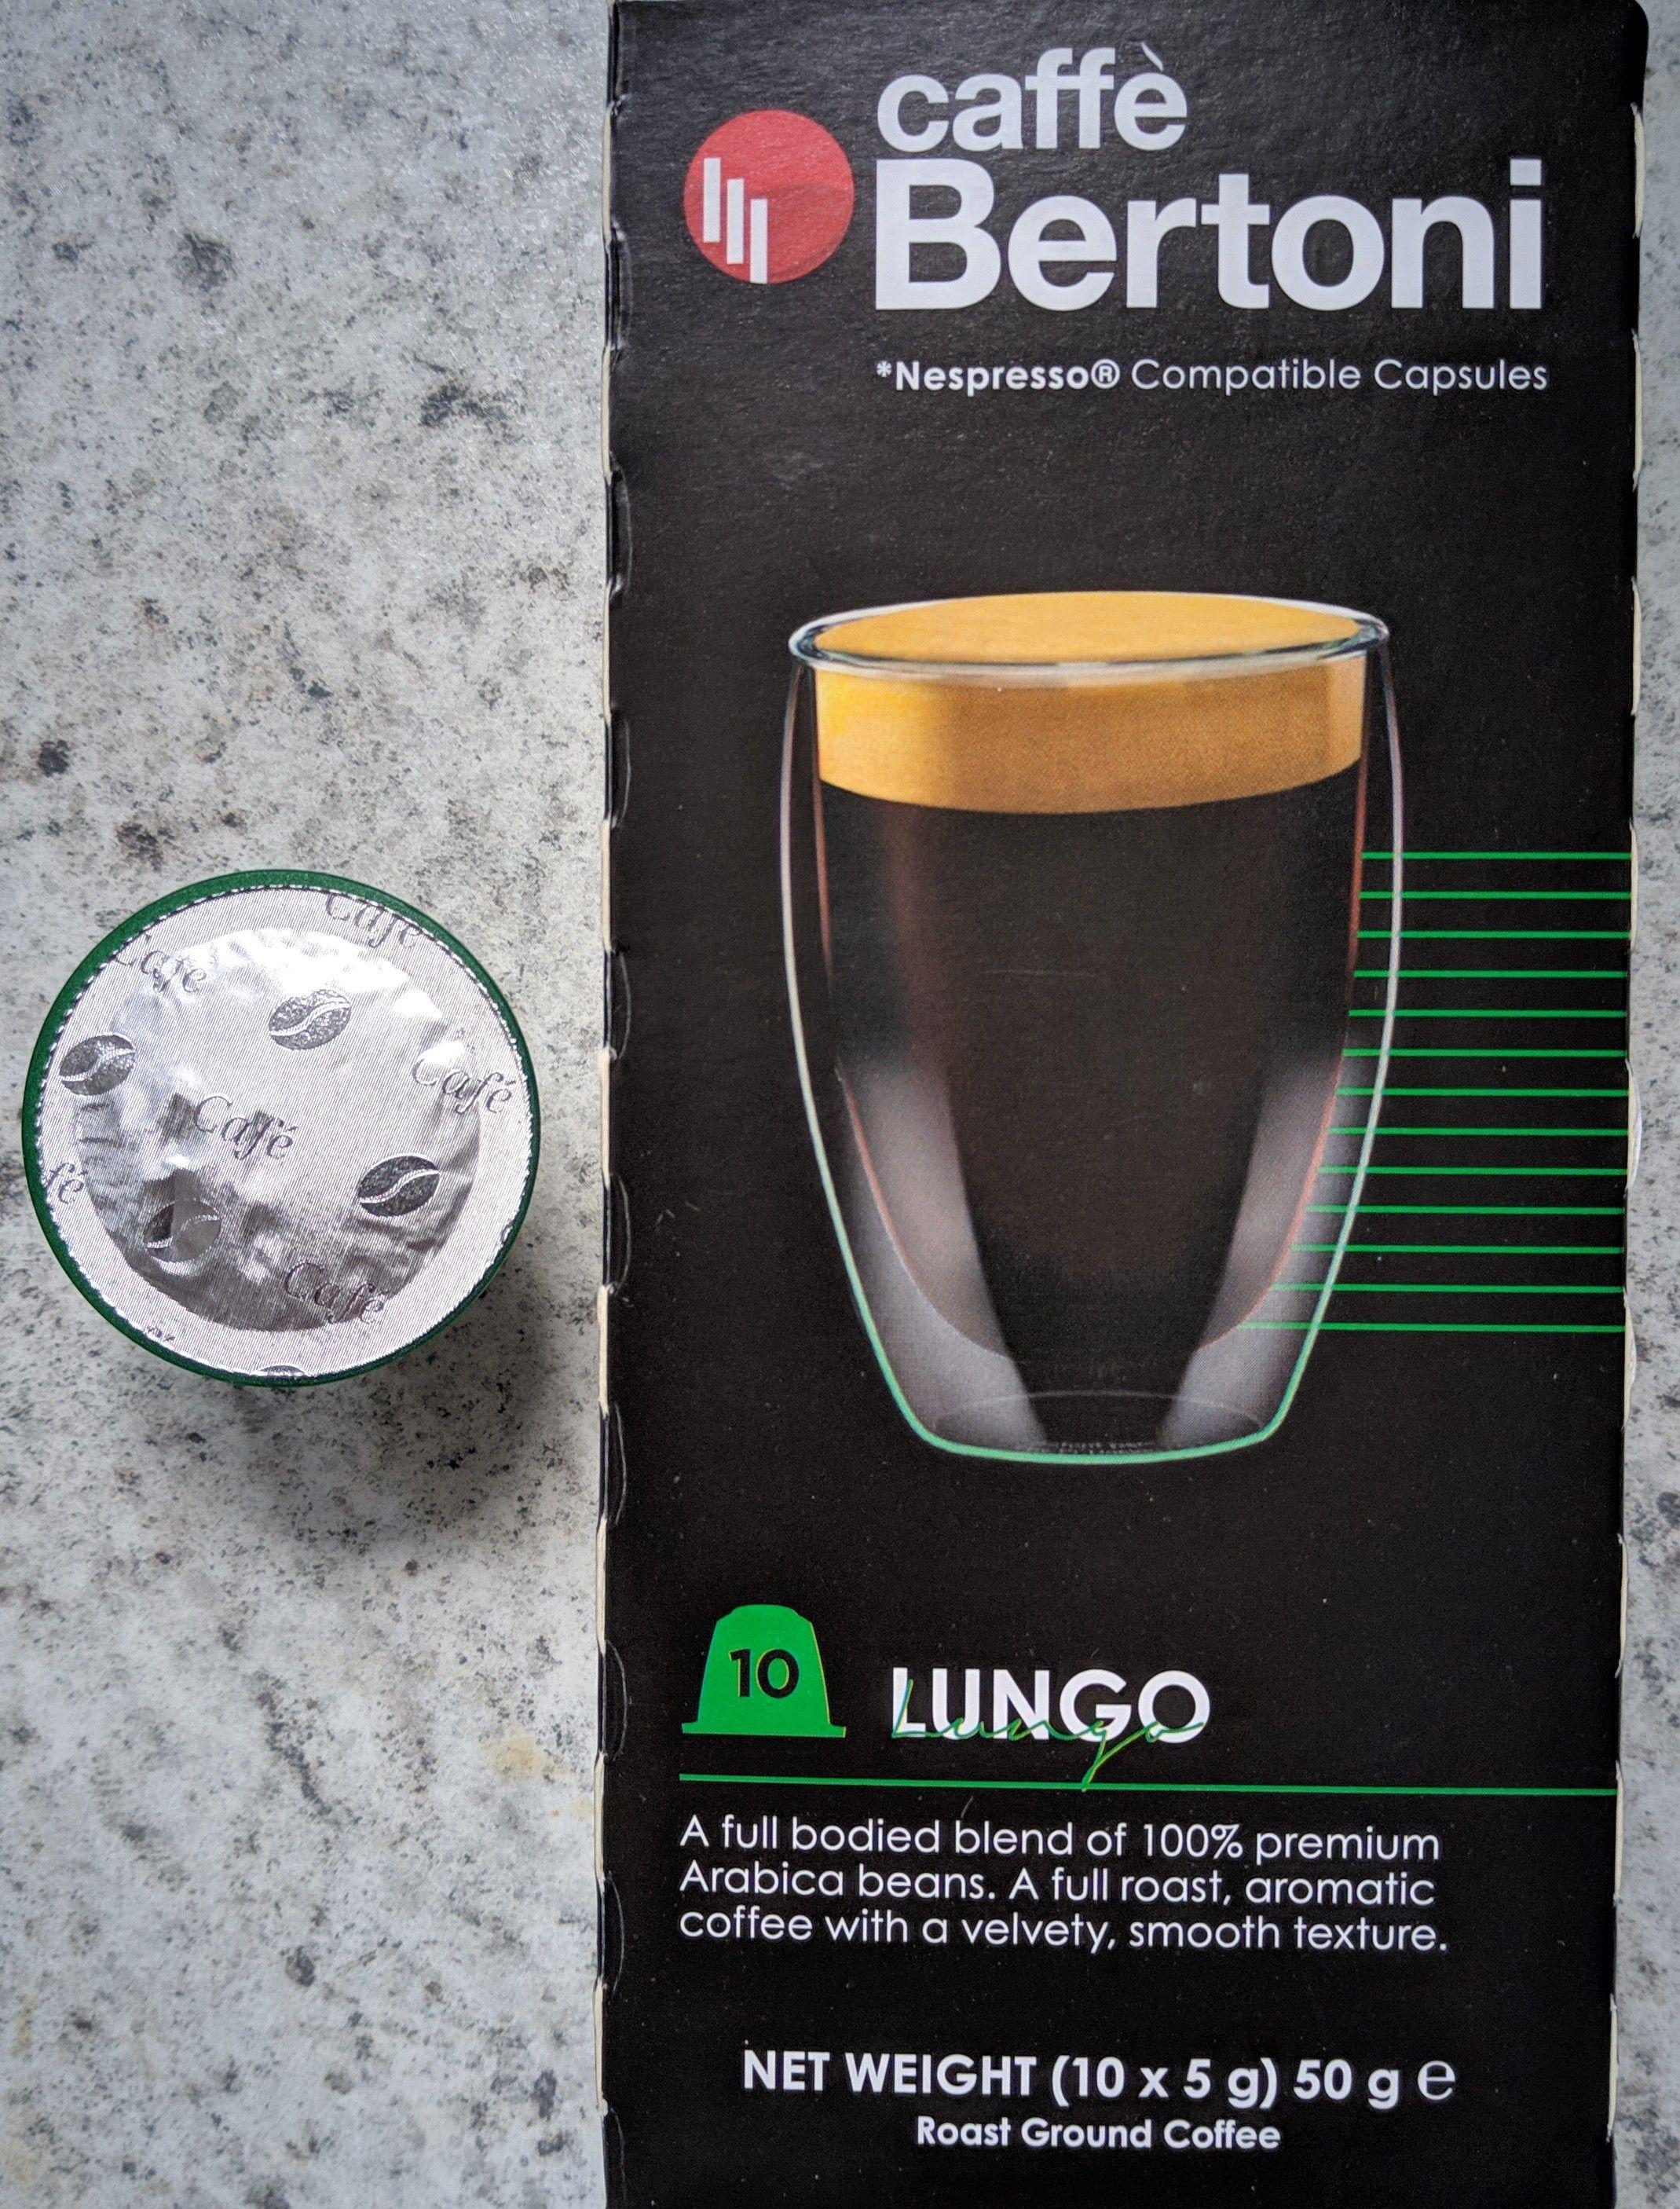 Caffe Bertoni Nespresso compatible Lungo capsules (10 x 5g) 89p @ B&M Oswestry